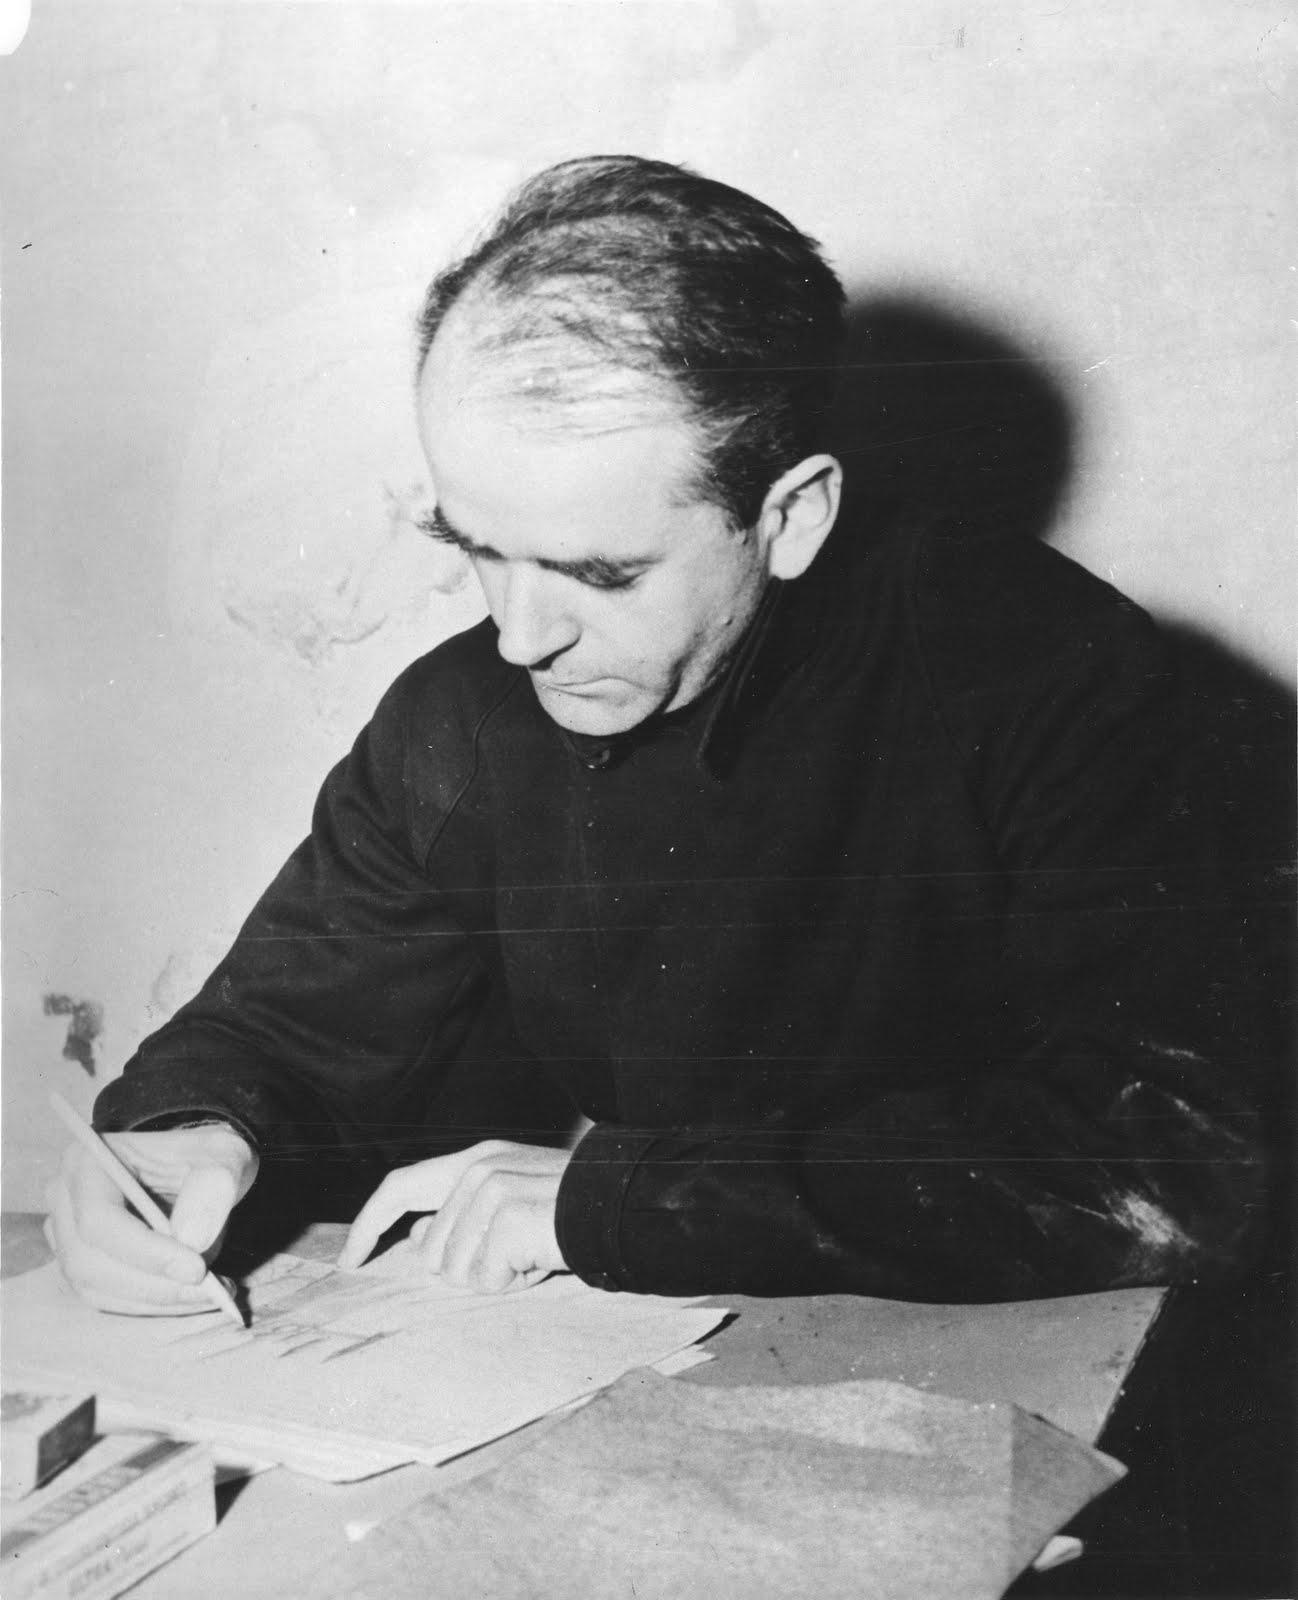 albert speer essay 2 The career of albert speer, architect of hitler's unbuildable capital germania (and  of the nazi war effort), is reviewed in reputations.